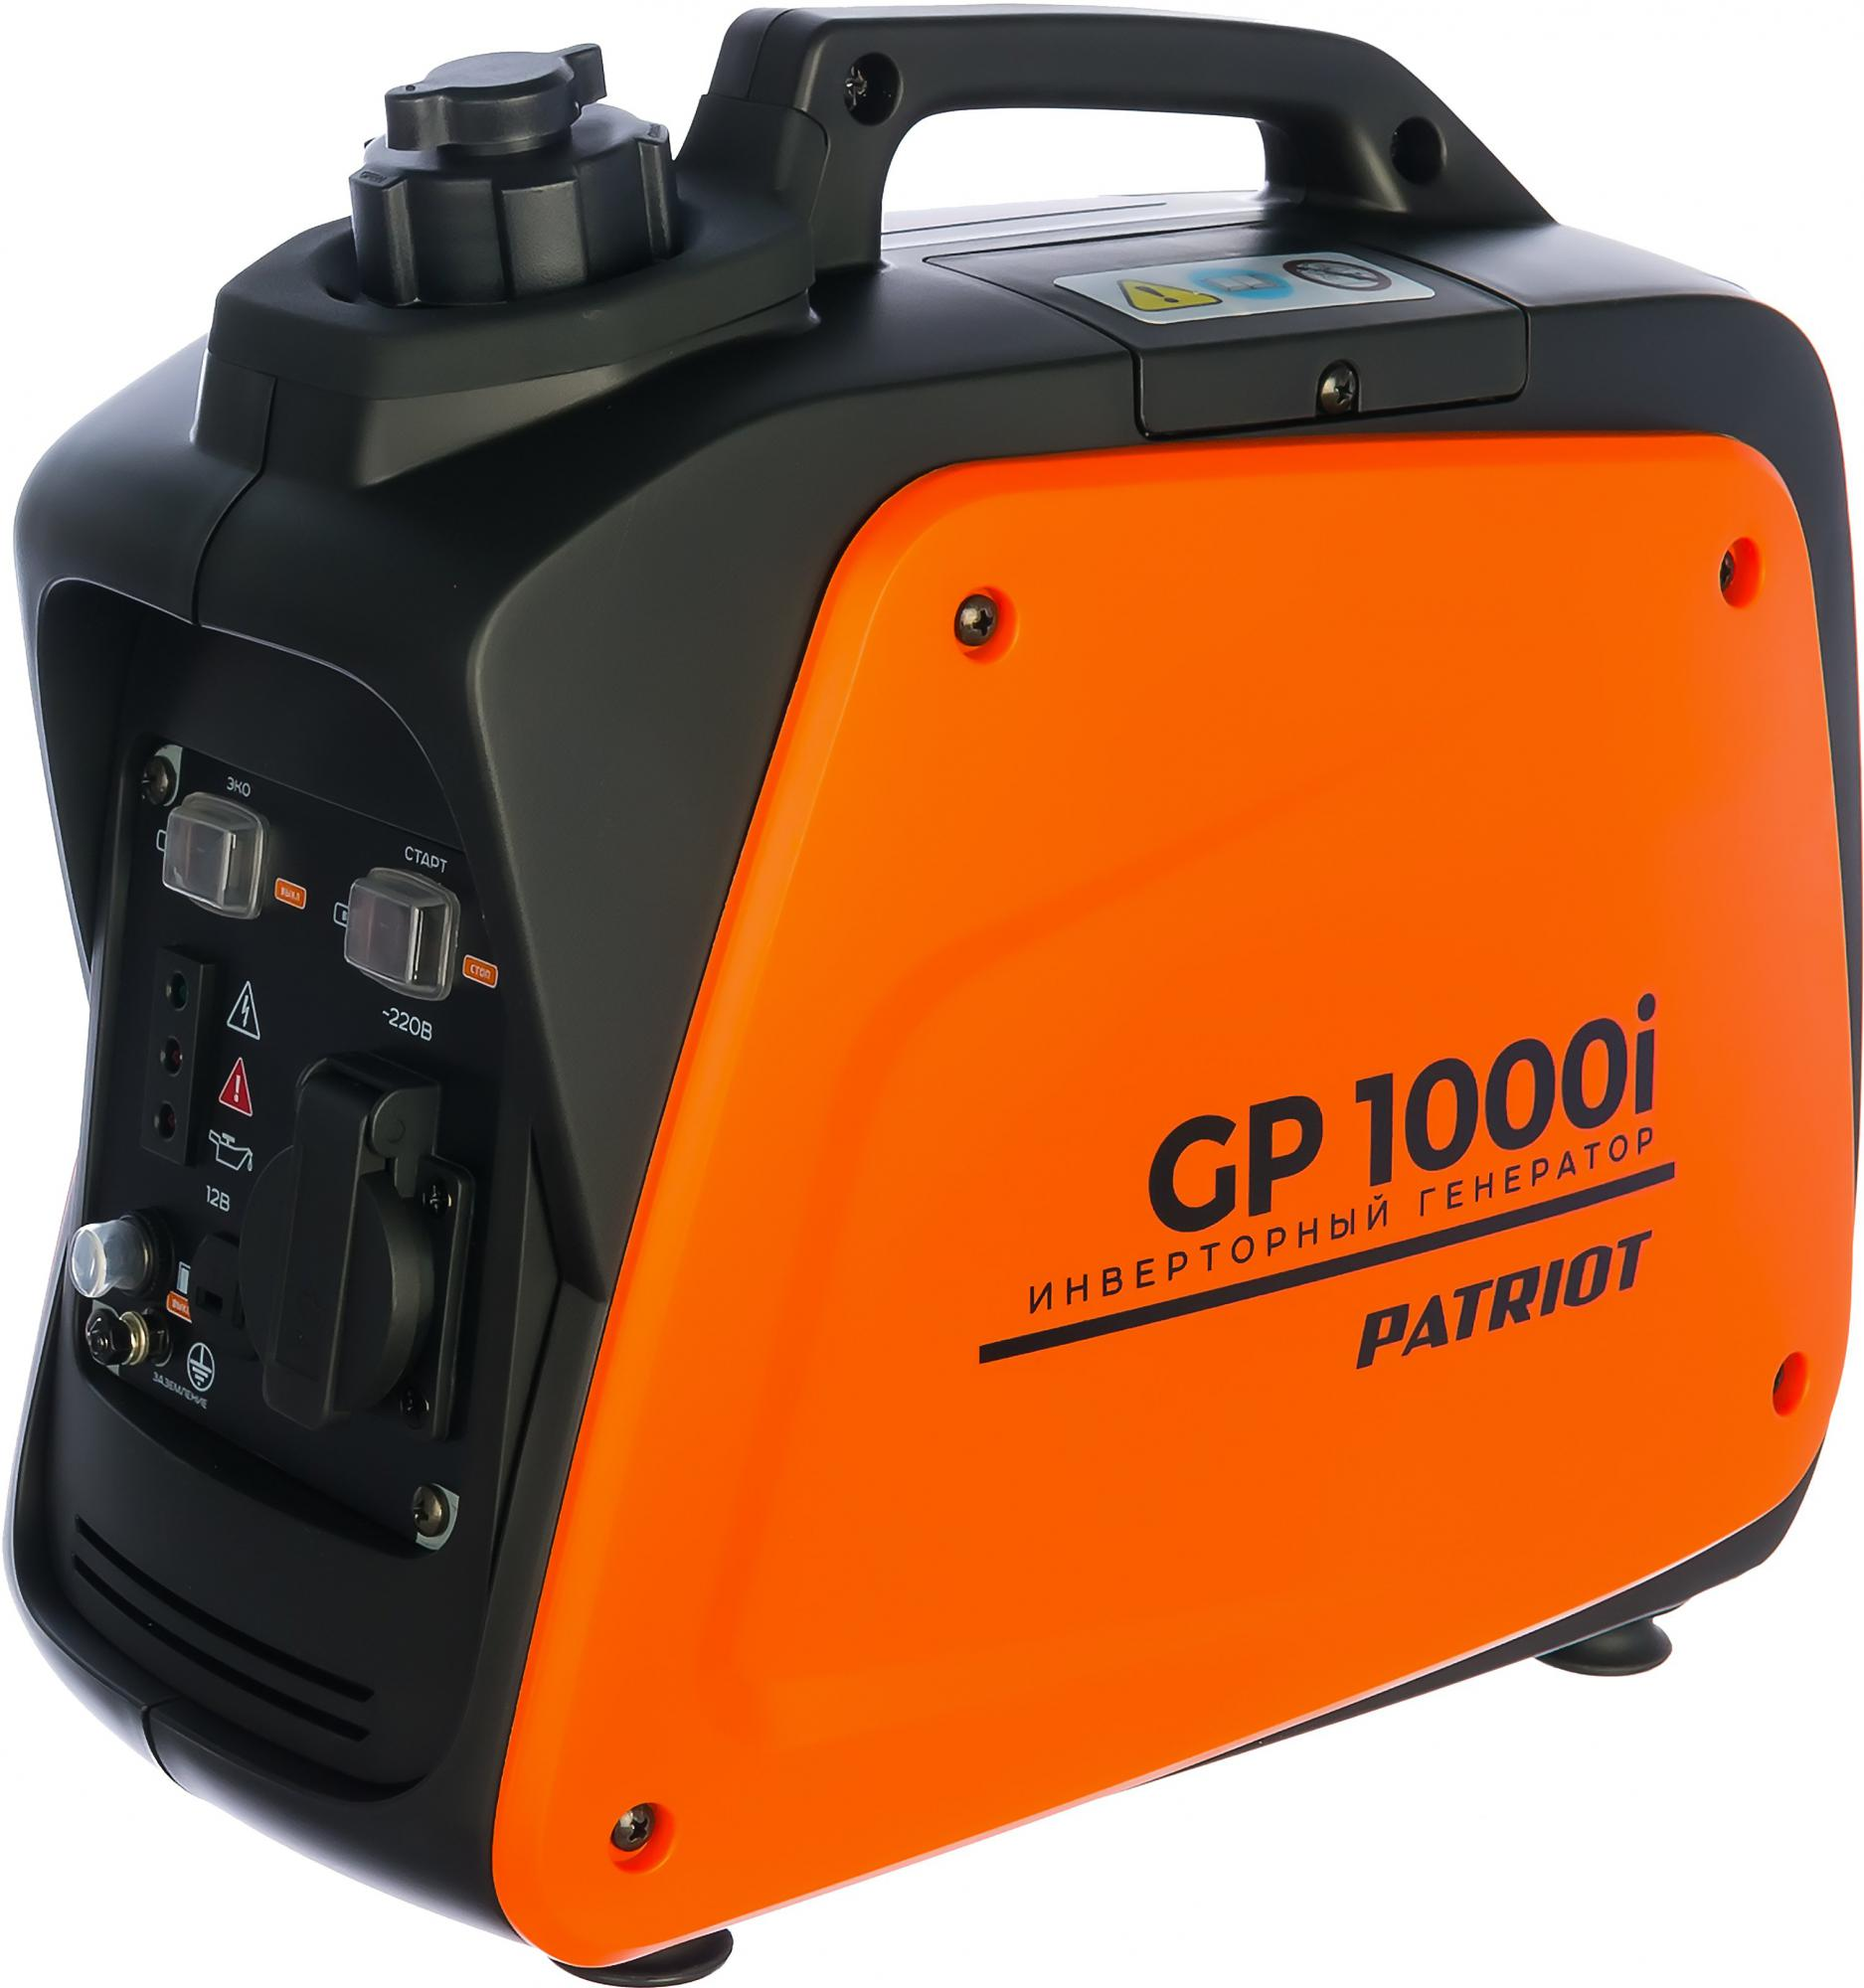 Электрогенератор Patriot 1000i